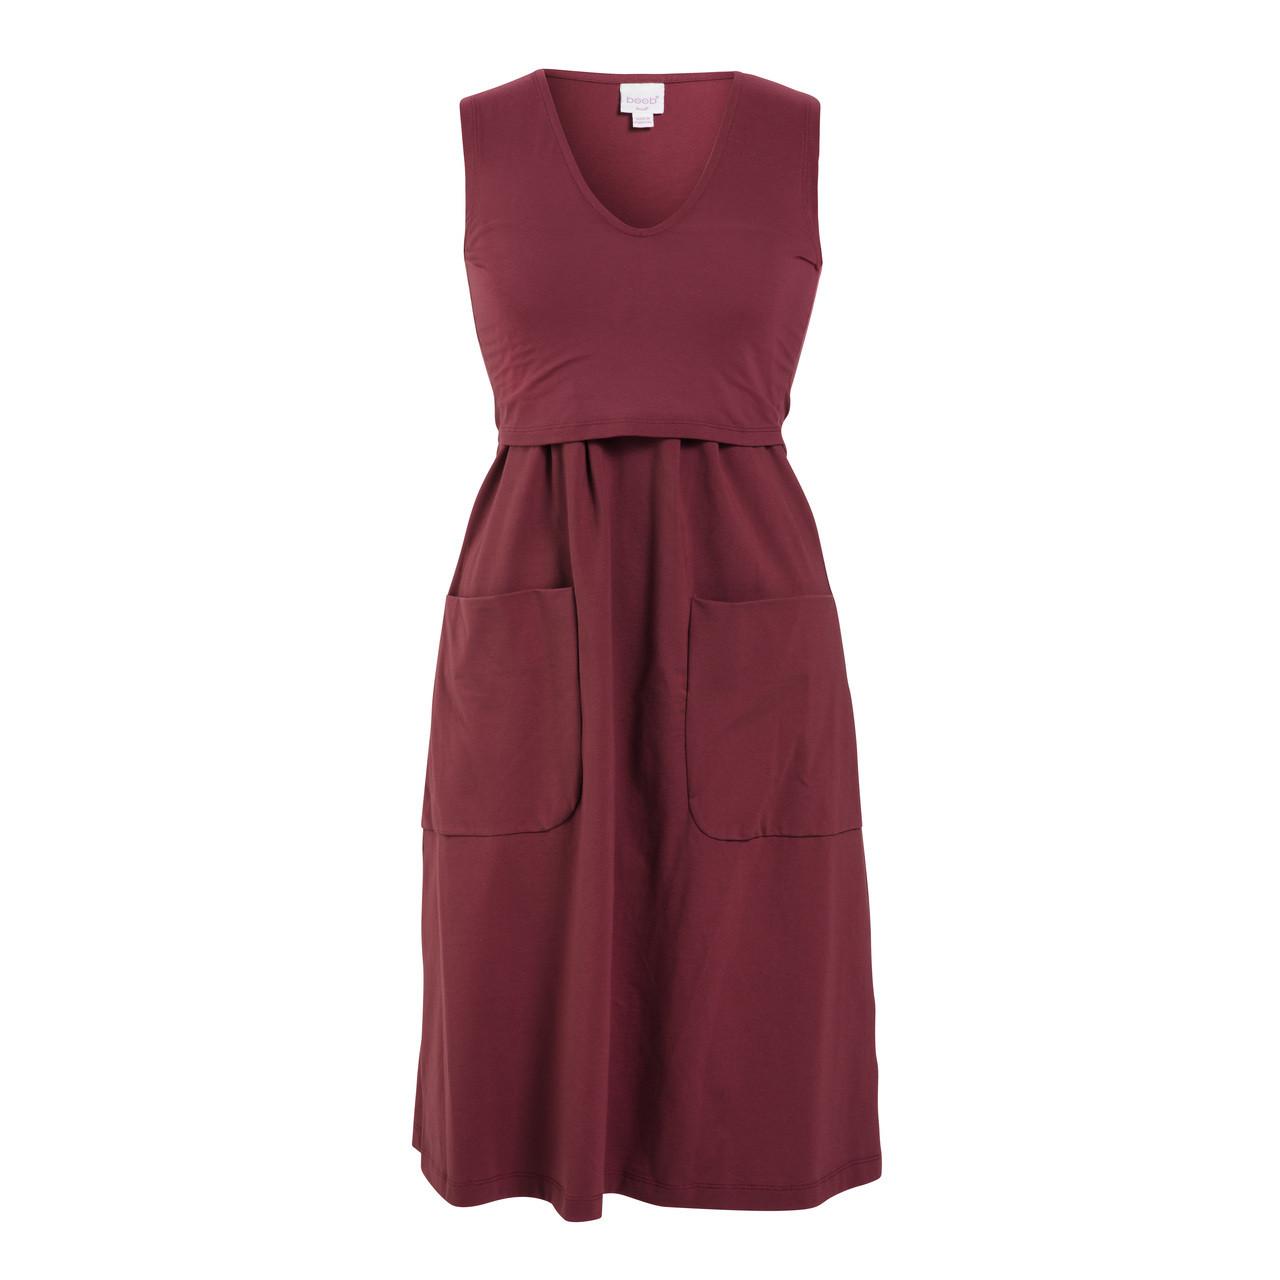 523bca96 Boob Design Depot Dress - Soft Cherry - Stockholm Objects